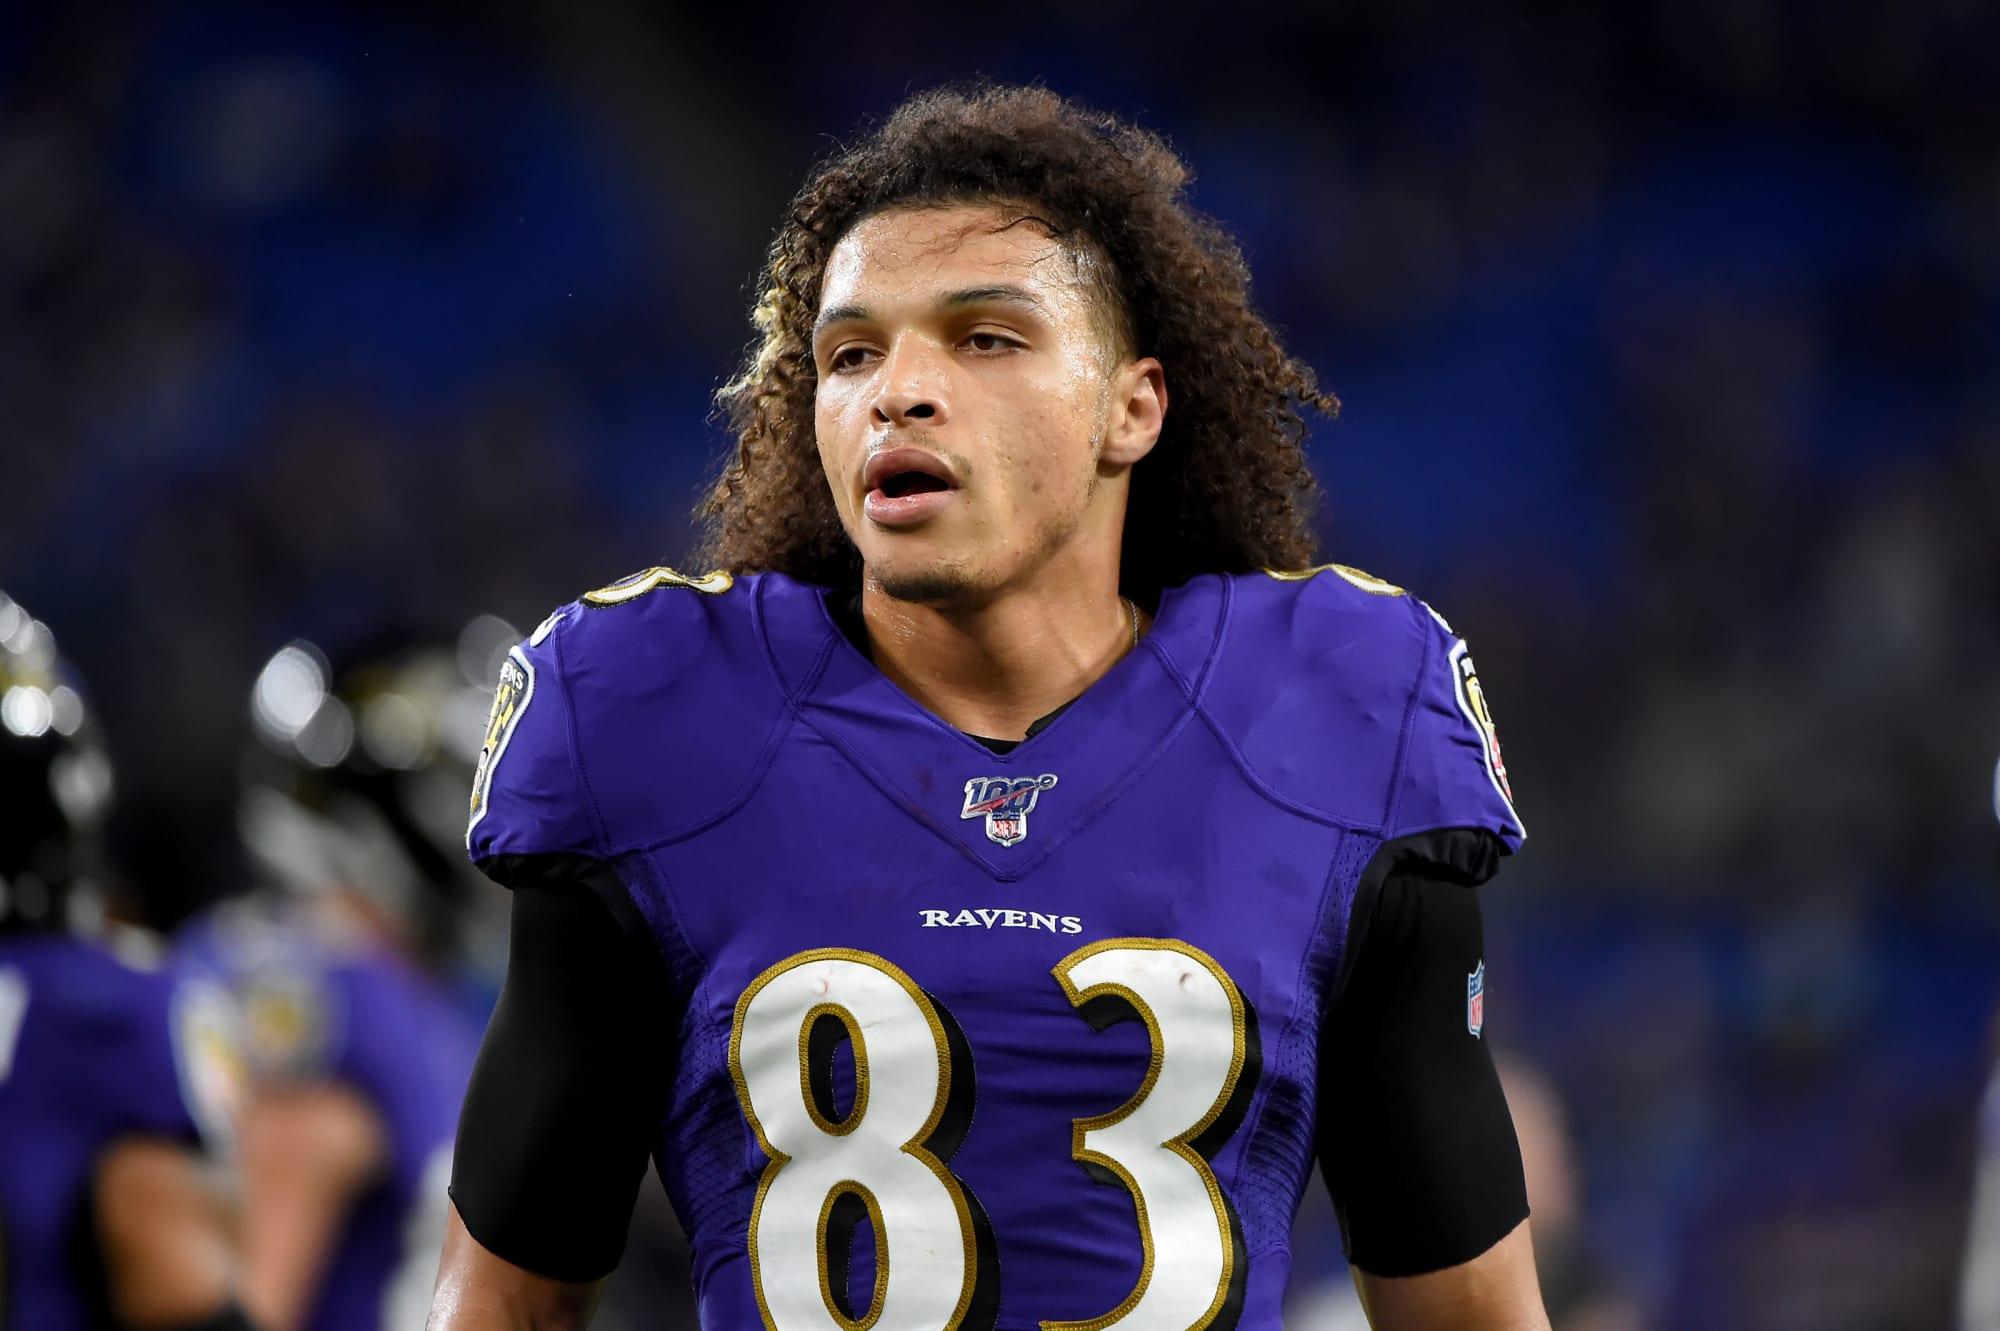 Baltimore Ravens 2020 season outlook: Willie Snead